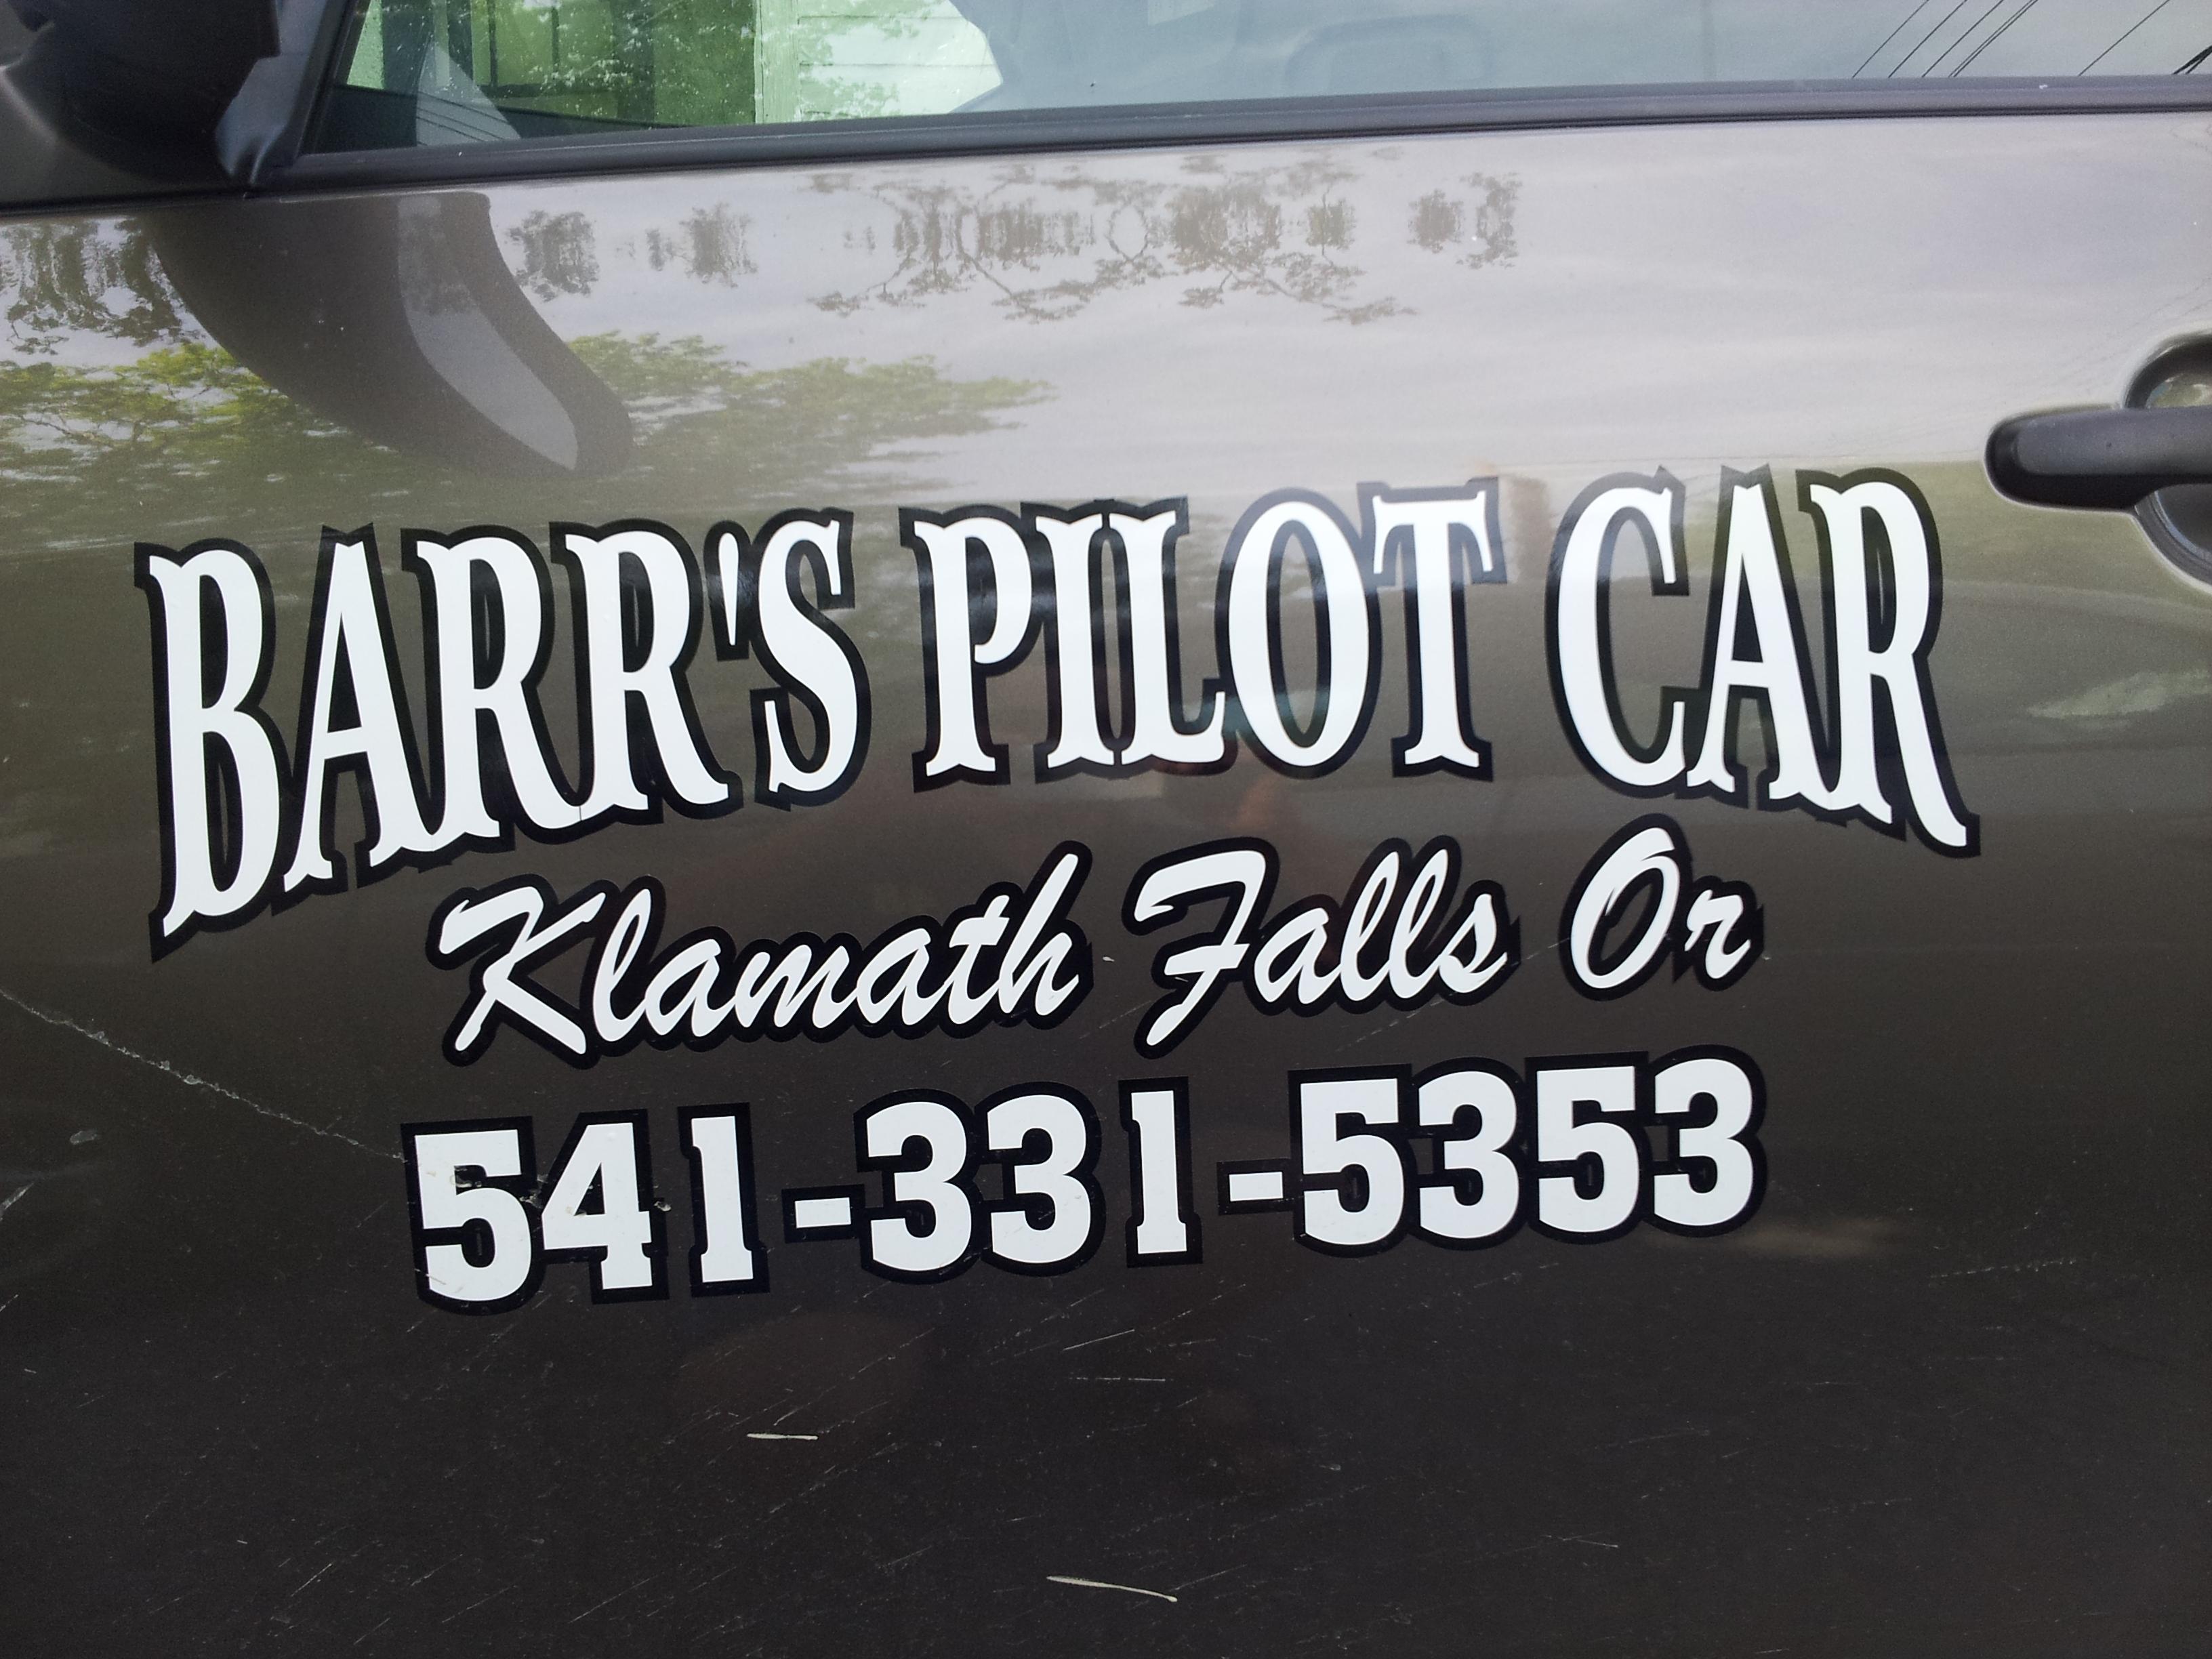 Barr's Pilot Car